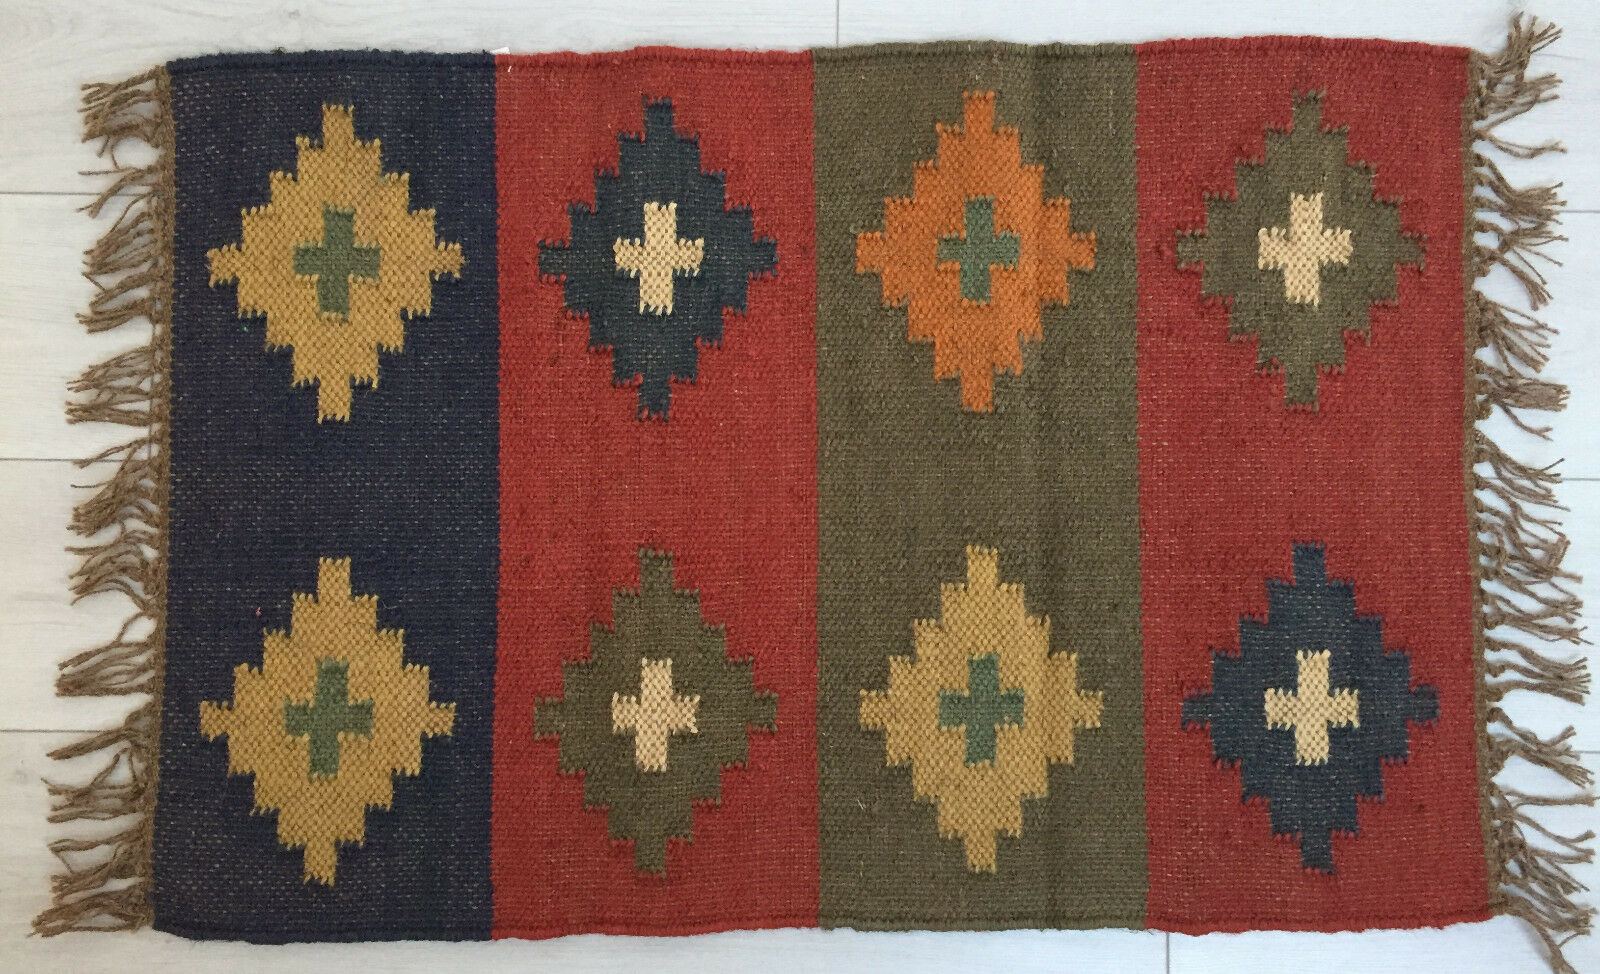 Piccolo Kilim Tappeto di Lana Indiano 60x90cm 0.6x0.9m Kelim Kelim Kelim Bordeaux Blu Scuro 533d1d